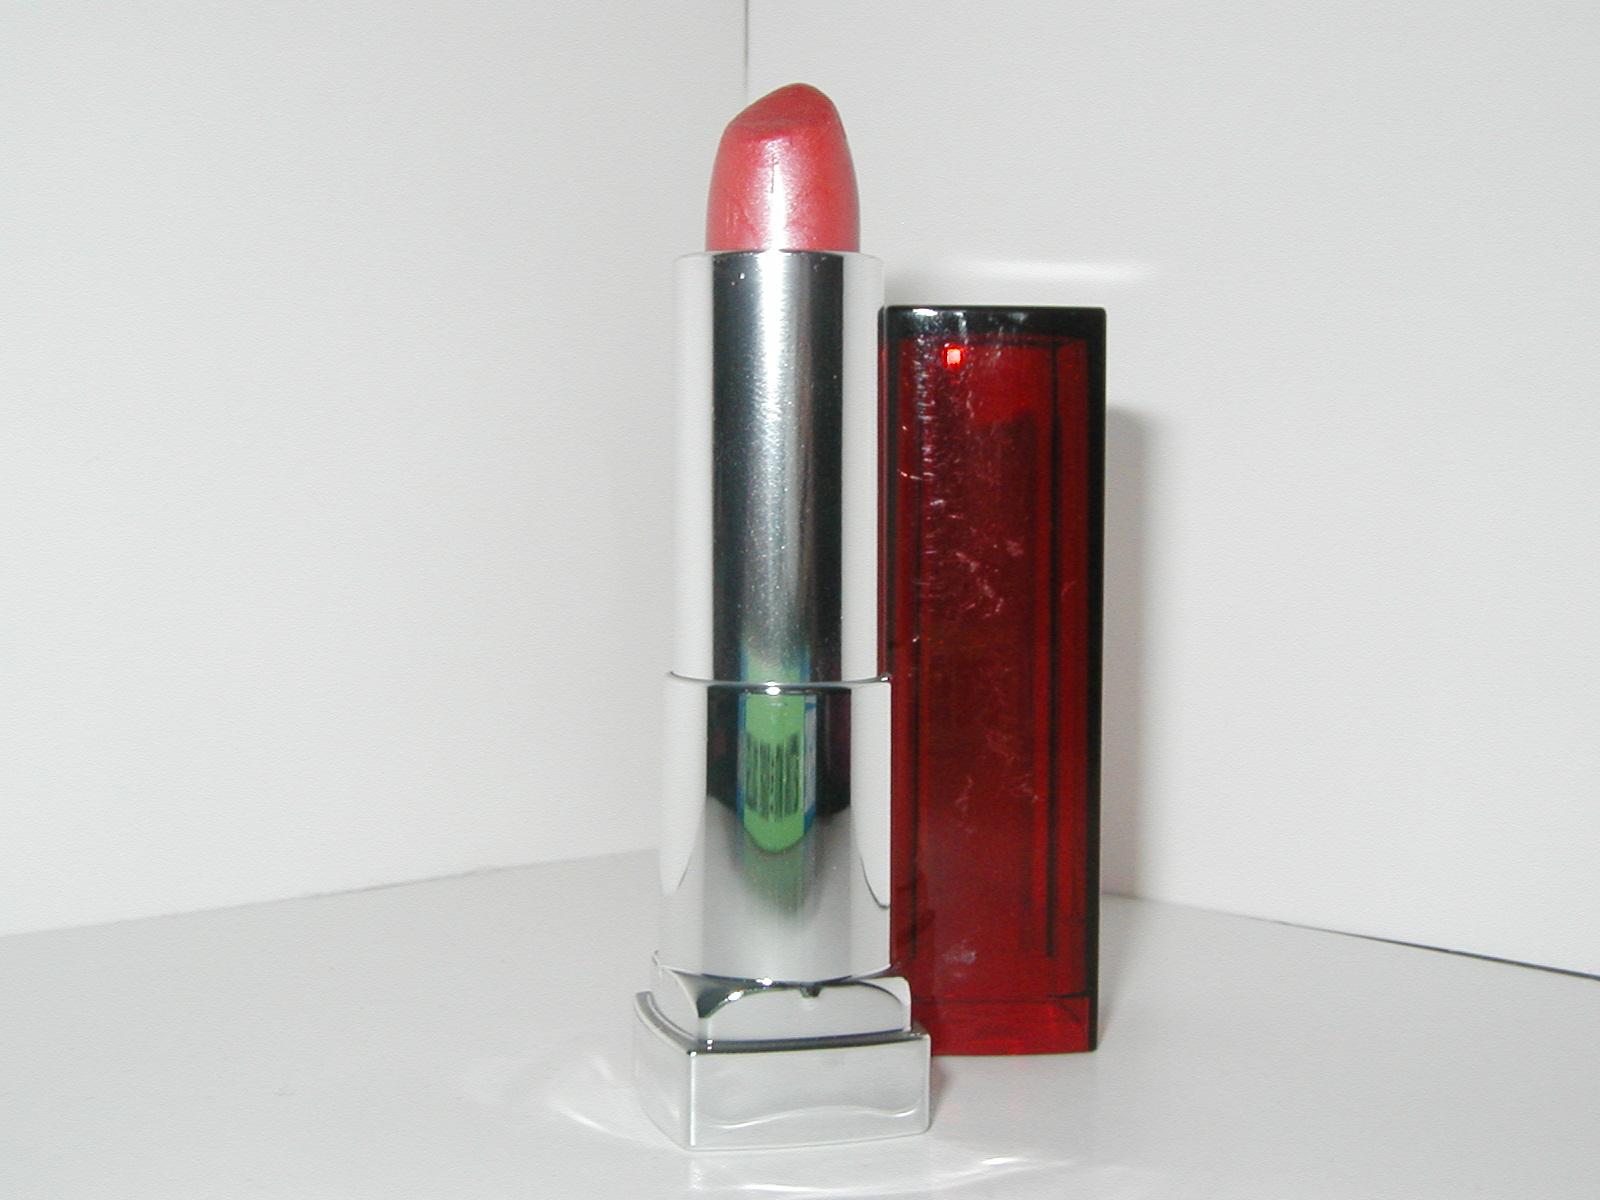 Pagina Porno Culonder maybelline color sensational lipstick~peachy scene, review